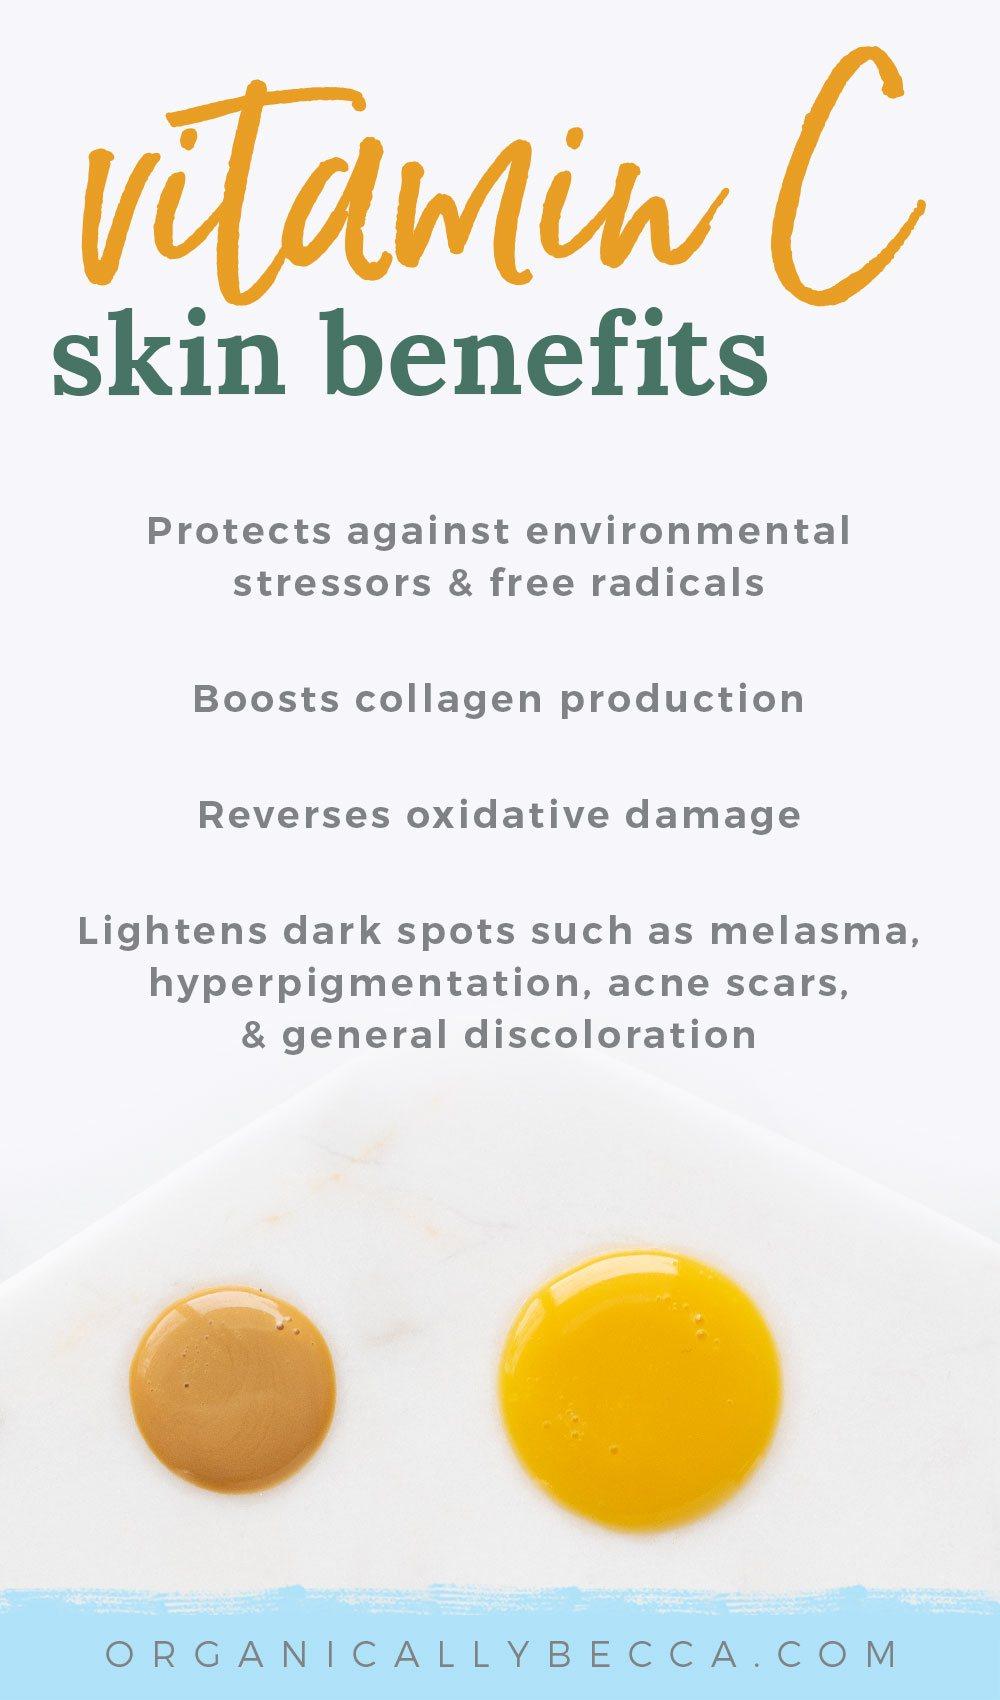 Skincare Benefits of Vitamin C